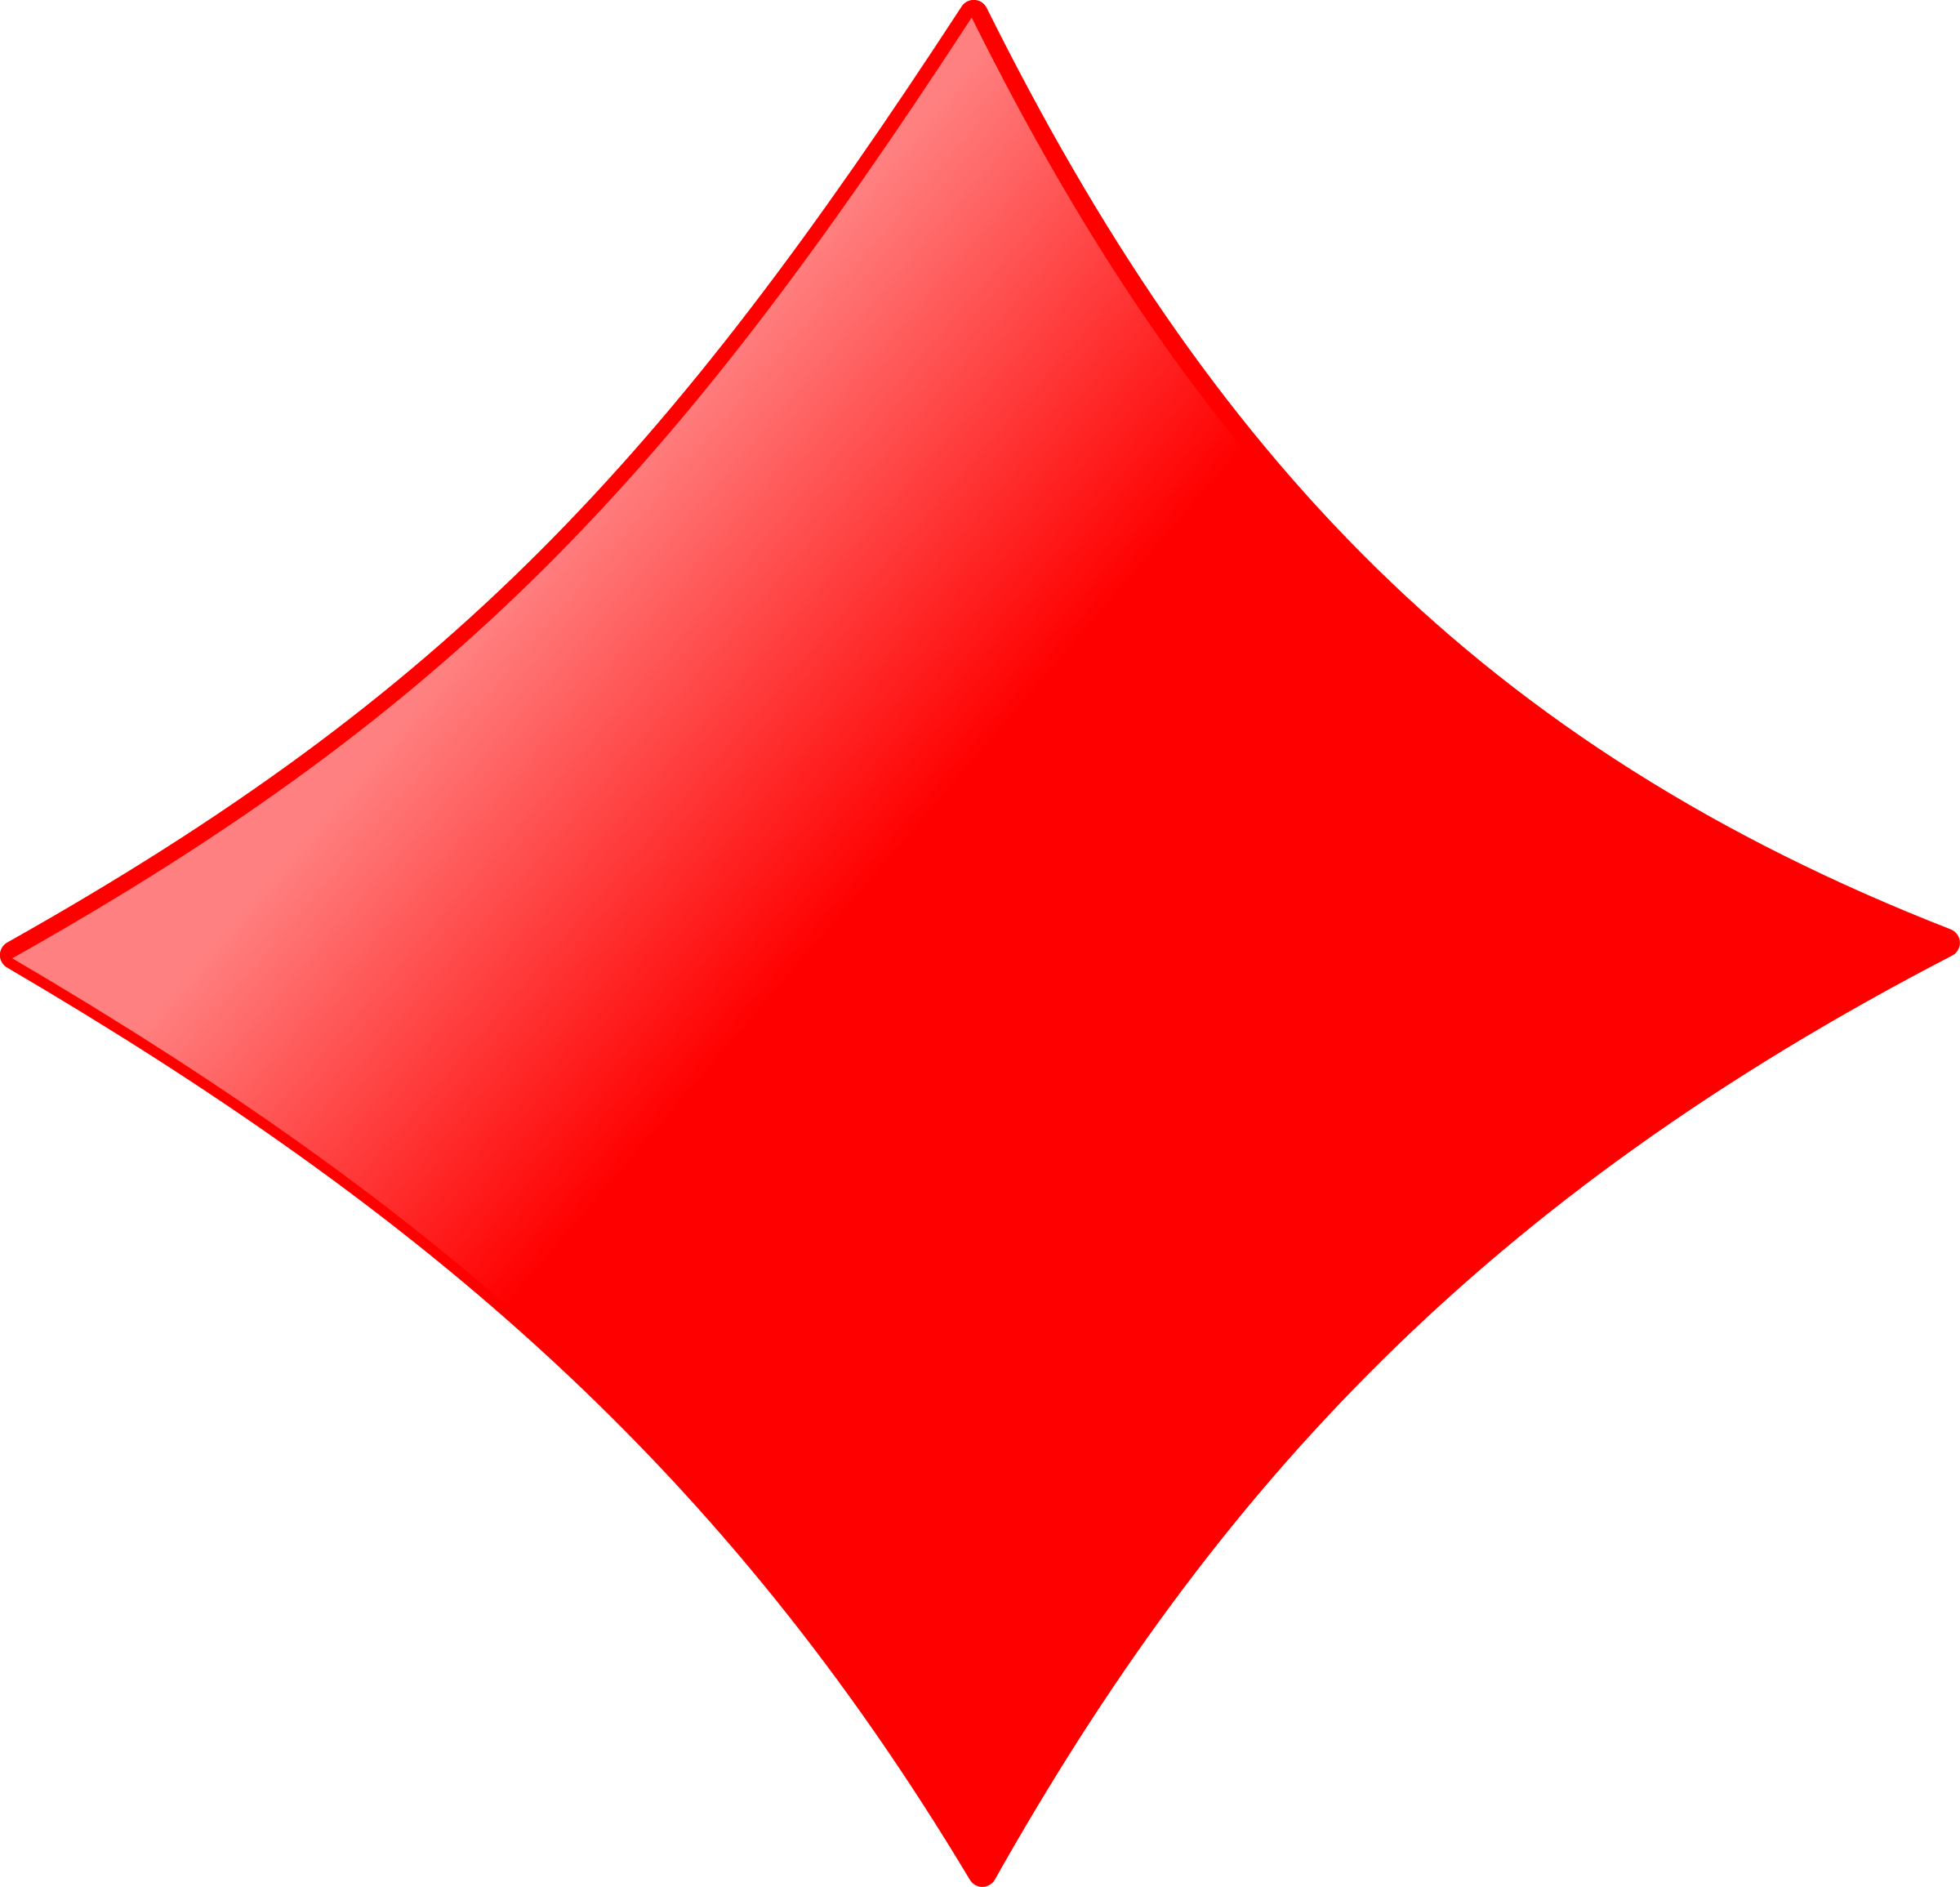 Diamond clipart card. Symbols big image png